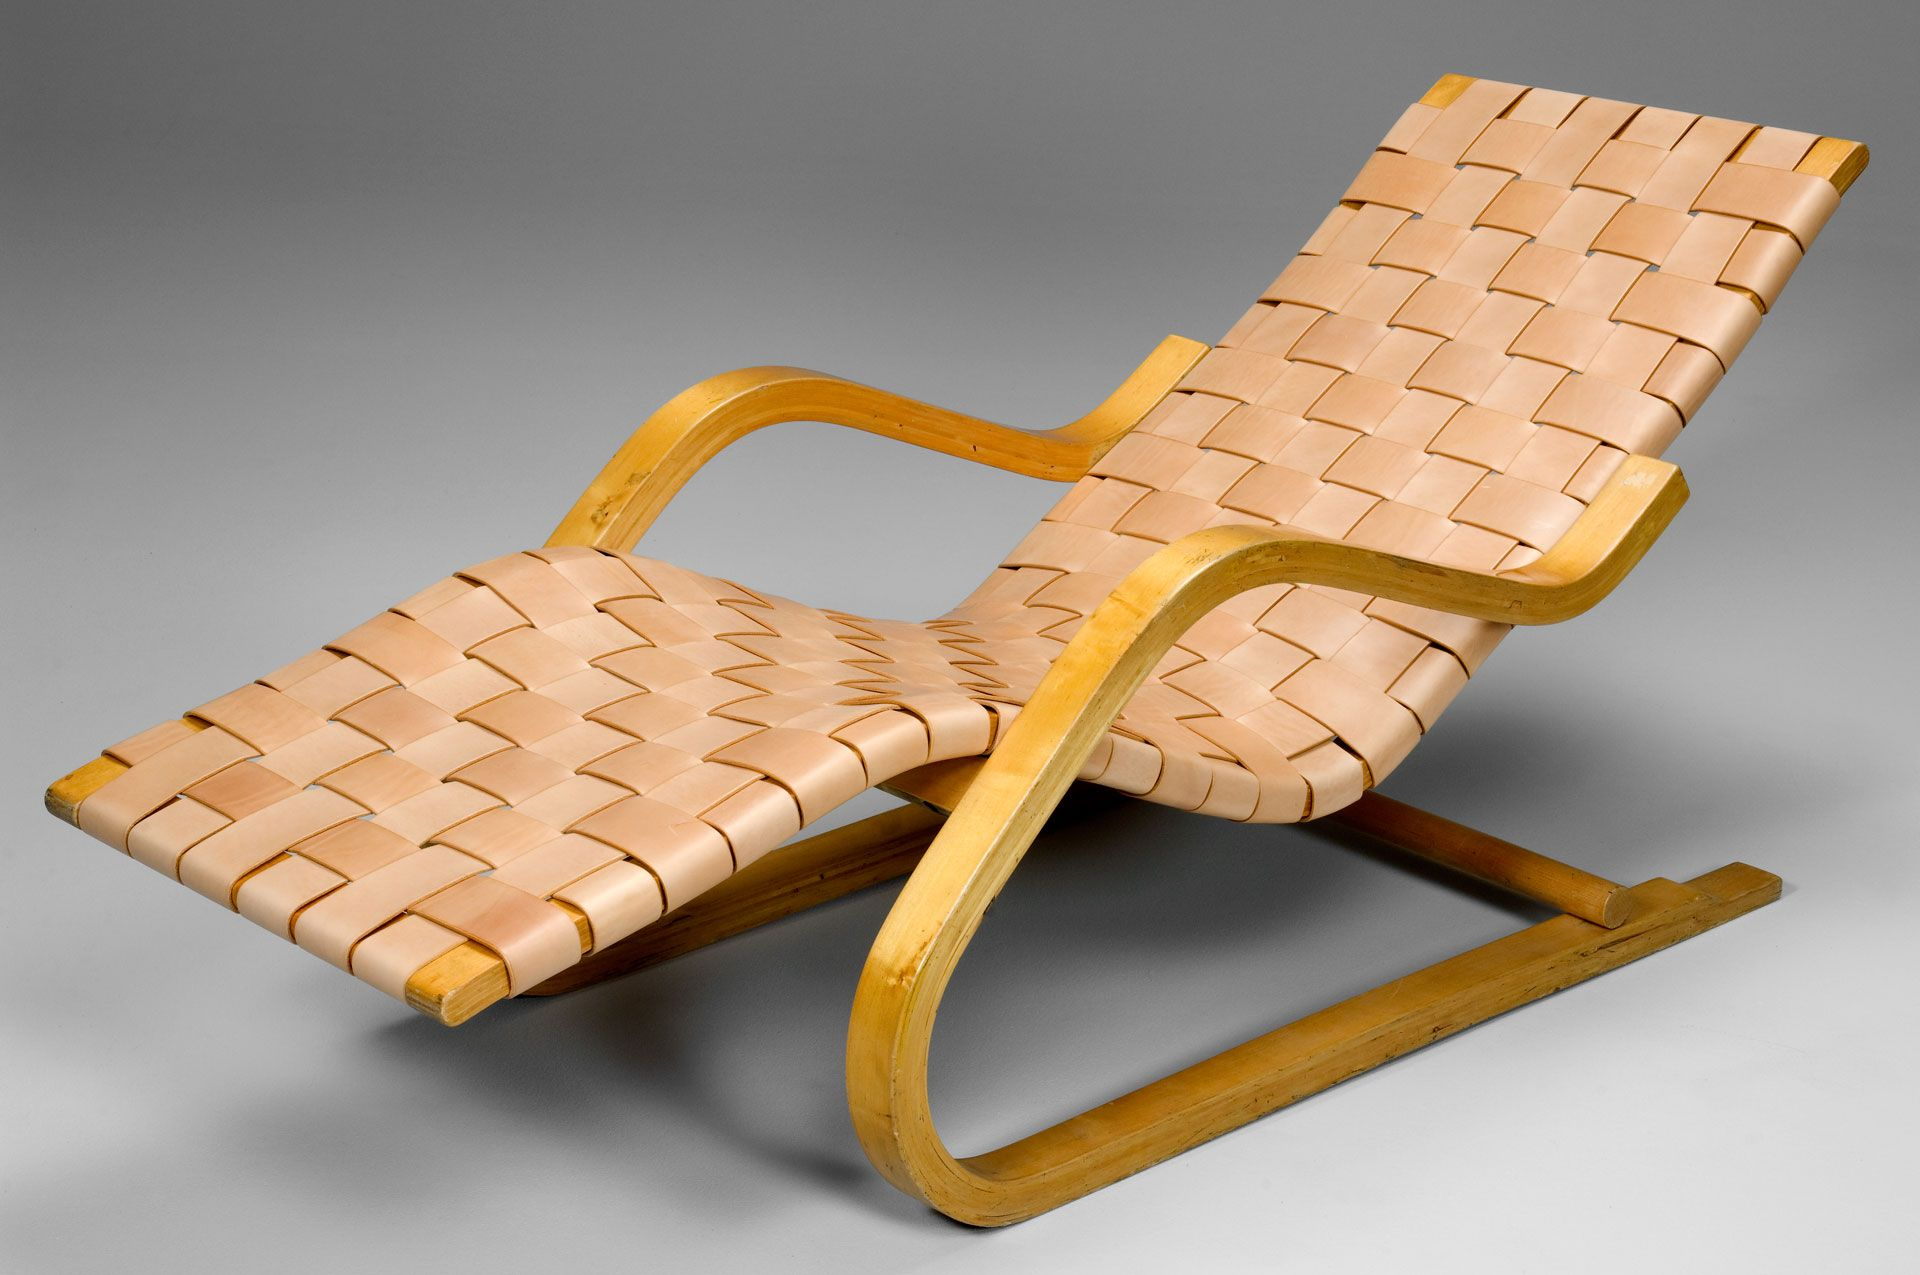 Groovy Alvar Aalto Lounge Chair No 43 Chair Alvar Aalto Pabps2019 Chair Design Images Pabps2019Com